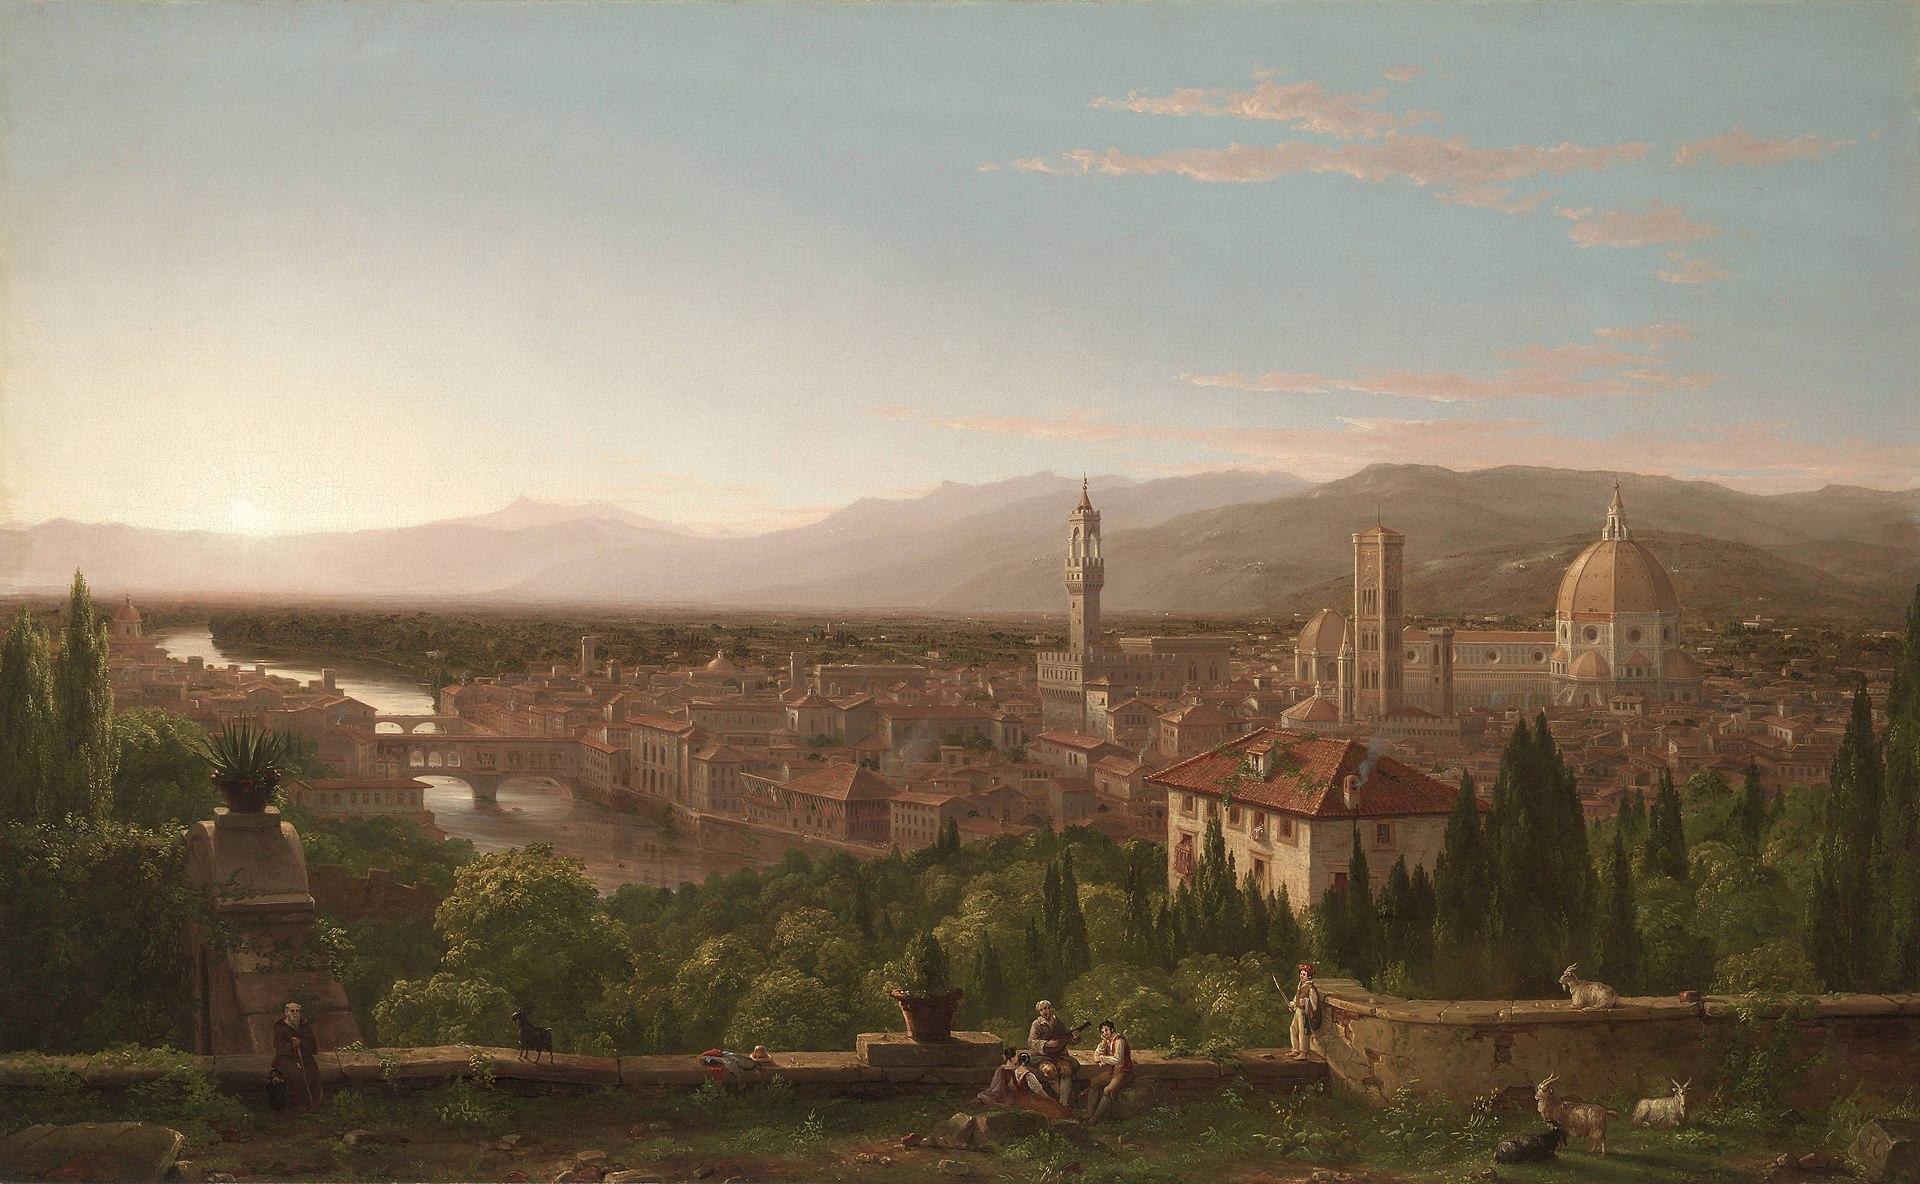 Коул Томас Вид на Флоренцию из Сан-Миниато 1837.jpg